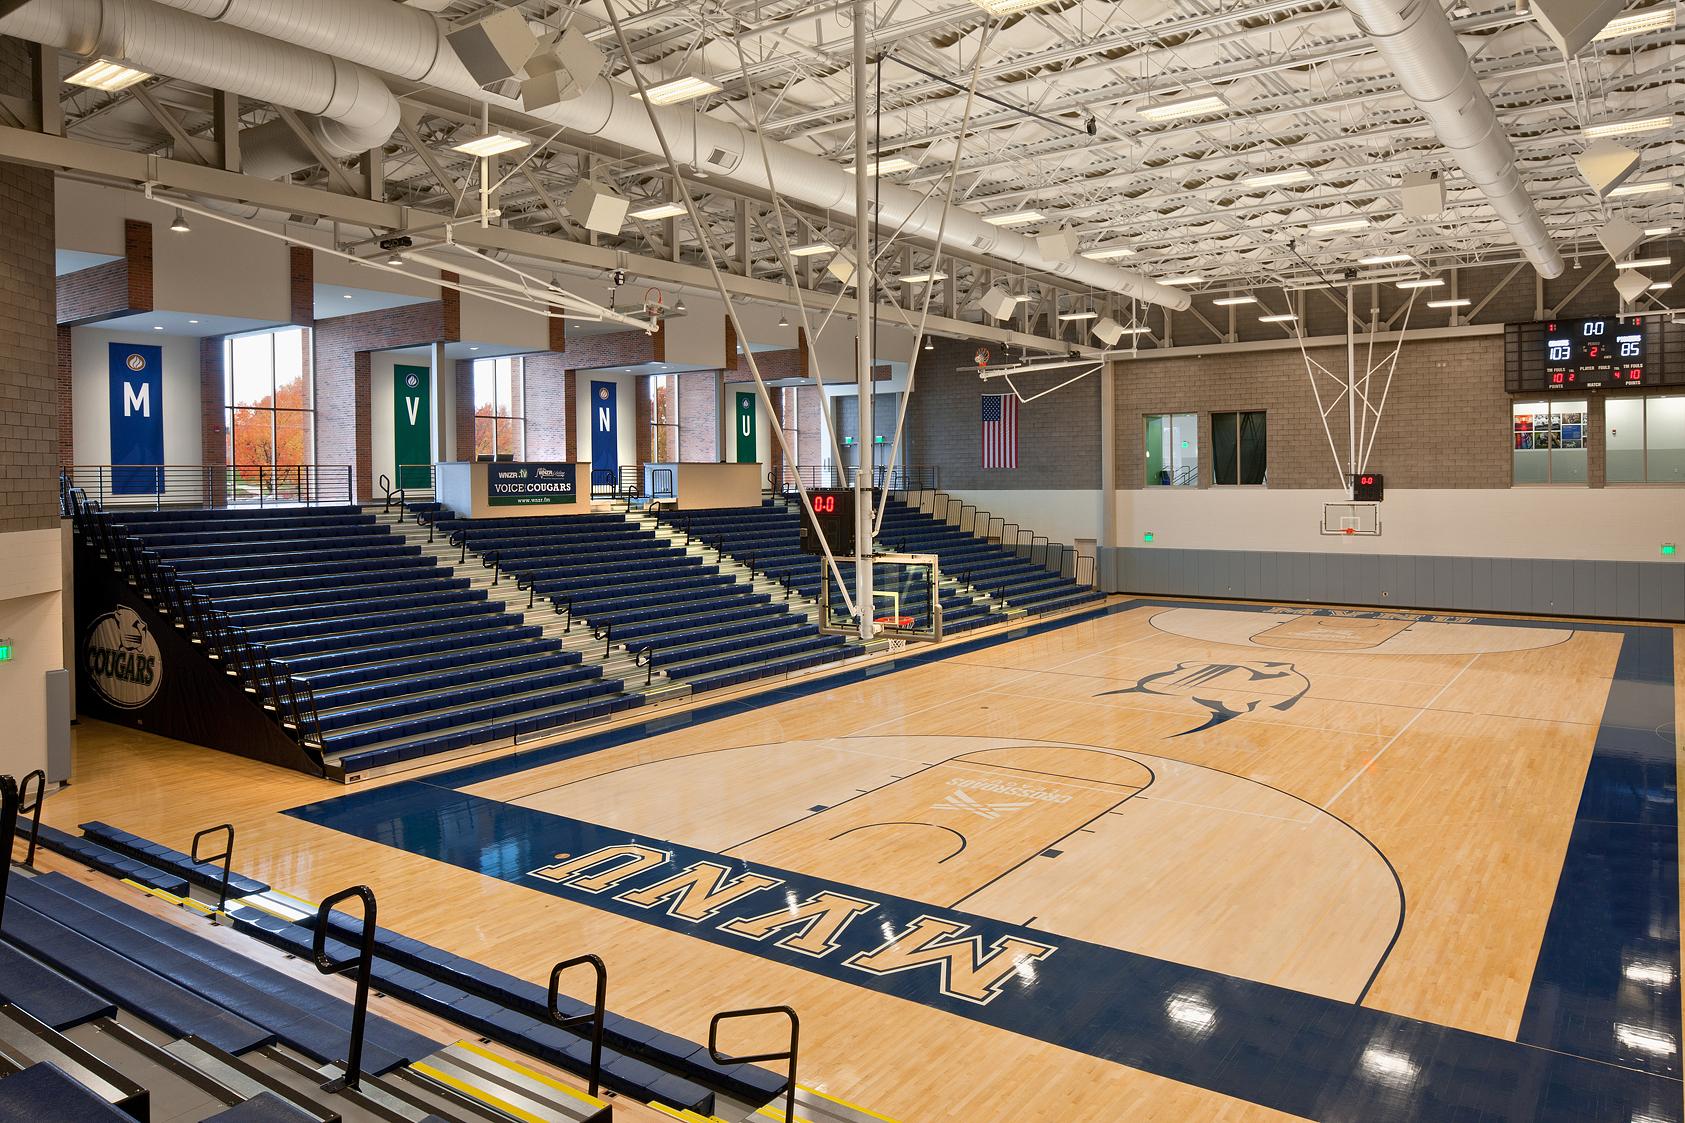 Ariel Arena - Mount Vernon Nazarene University Mt. Vernon, Ohio